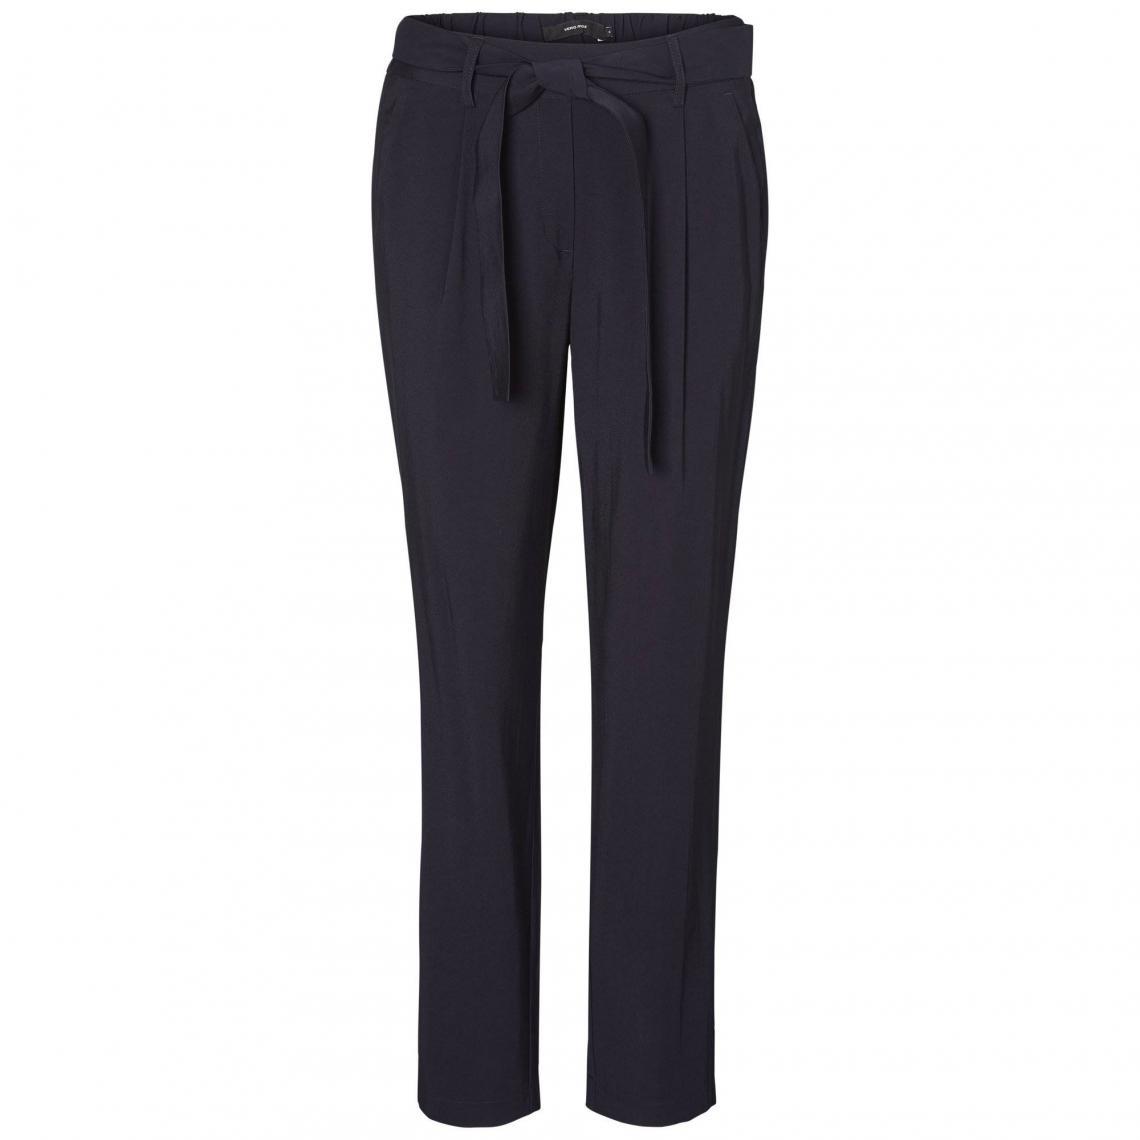 cb01f5f95409 Pantalon fluide femme Vero Moda - Bleu Marine   3Suisses